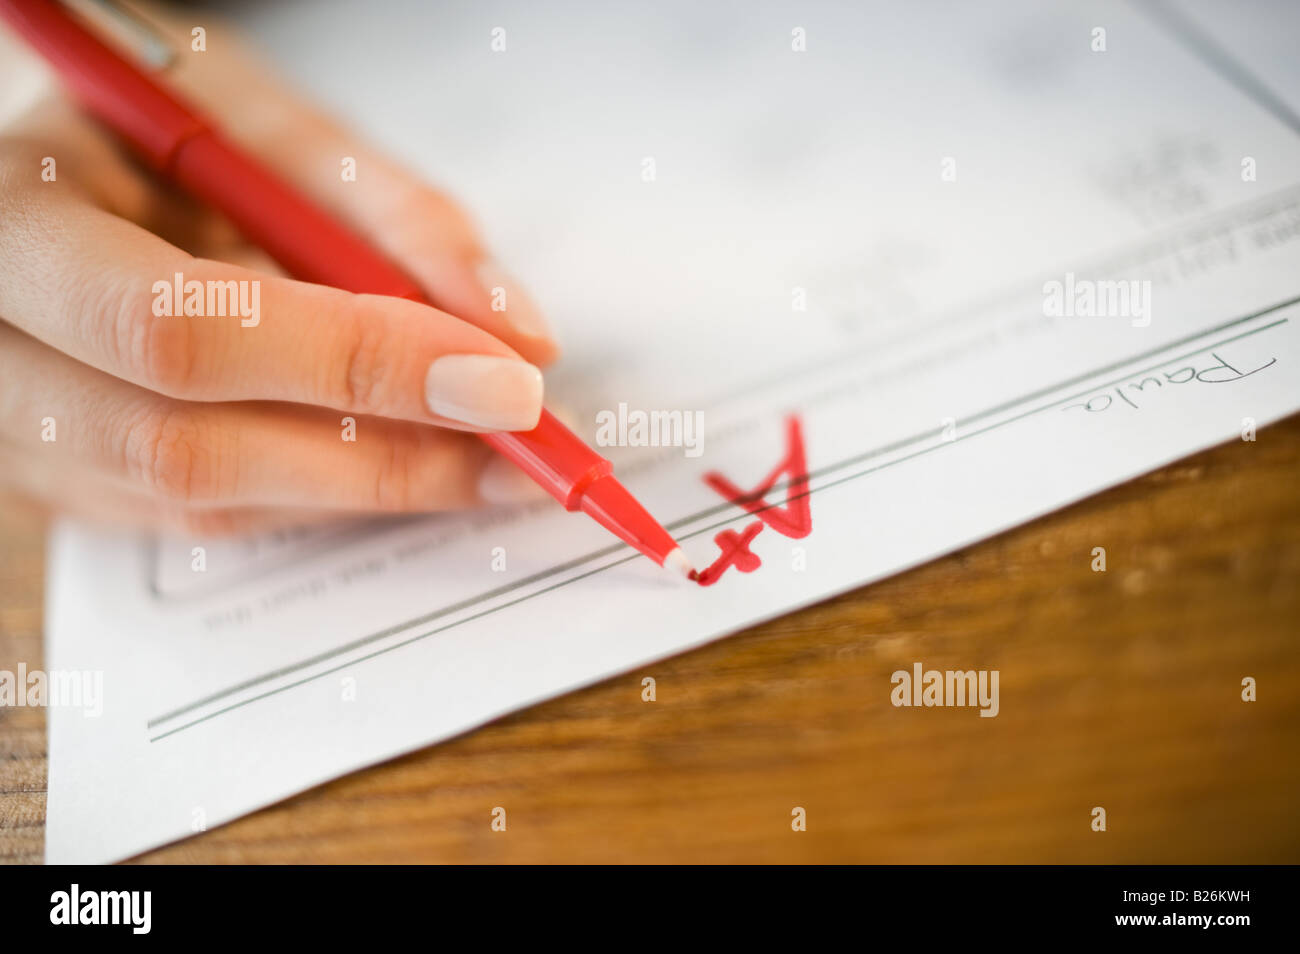 Teacher writing A plus grade on worksheet - Stock Image